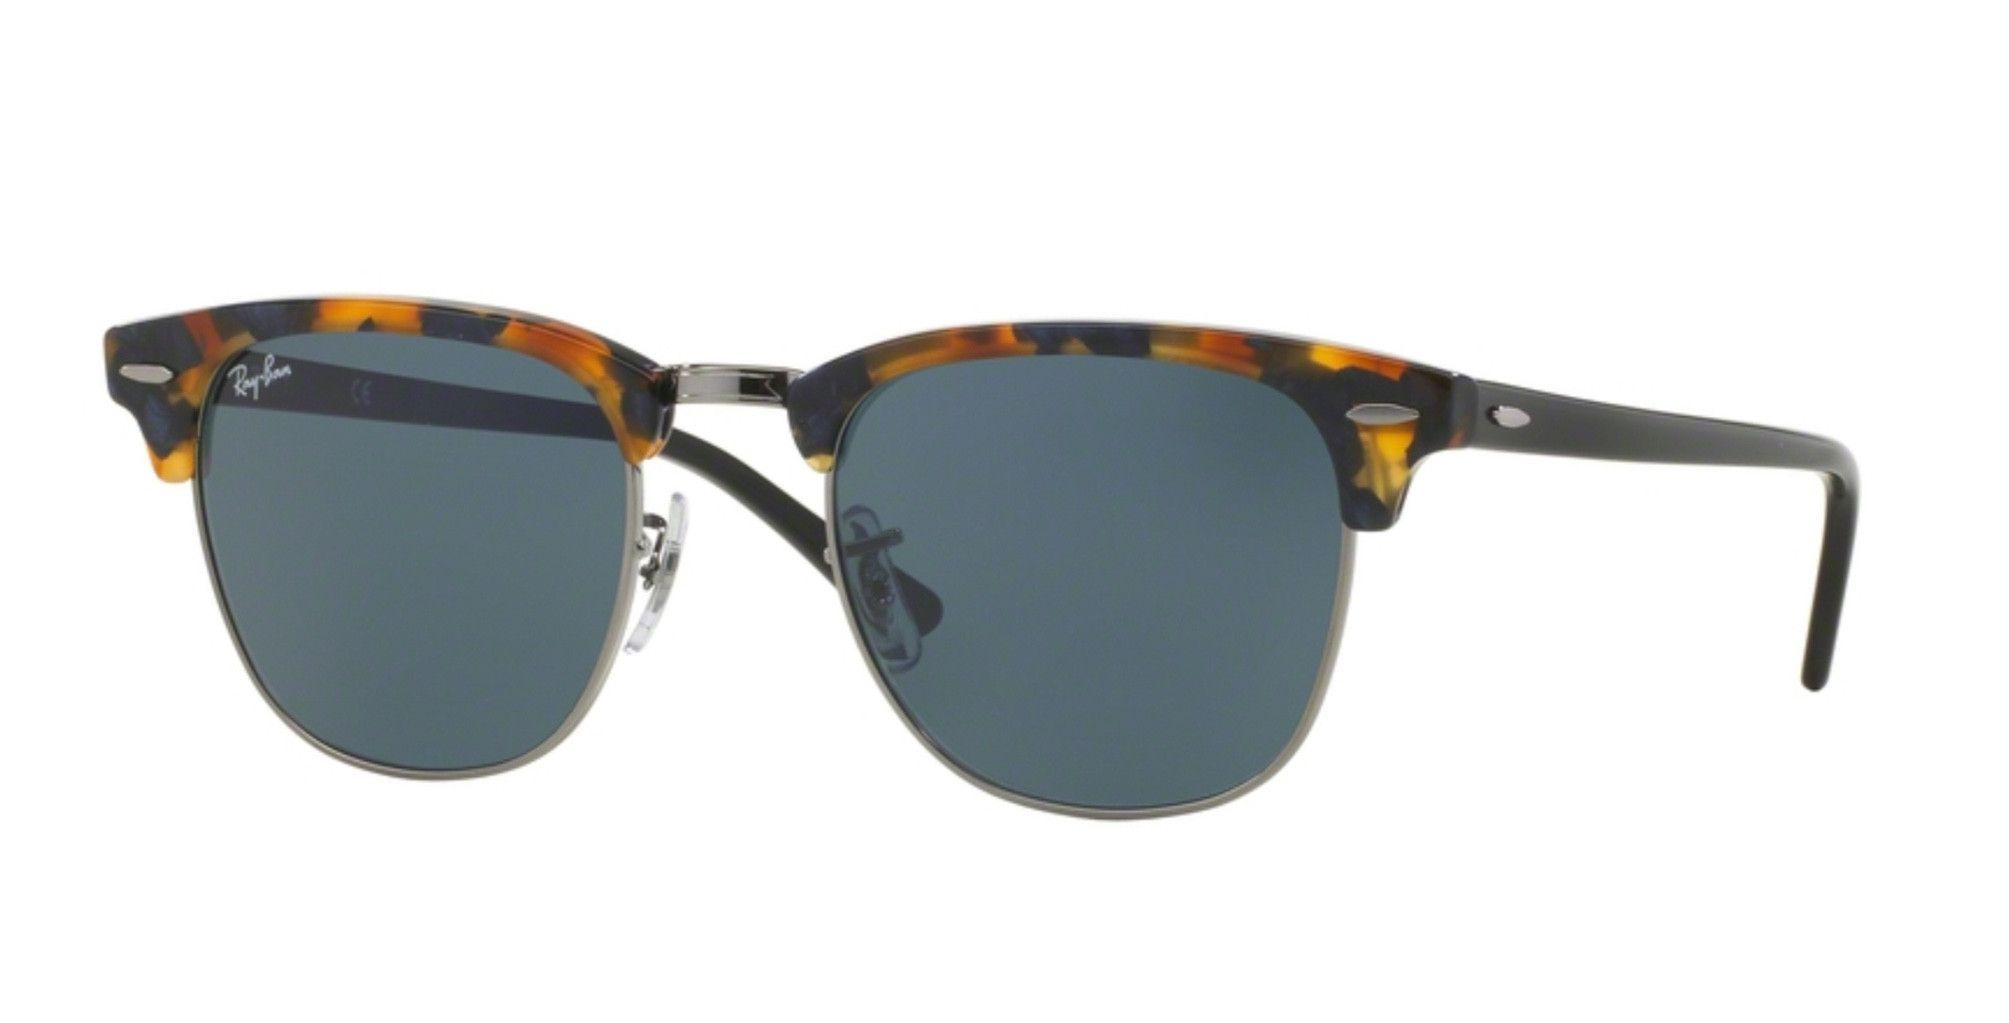 4421cca22c Ray Ban Rb2151 Wayfarer Sunglasses Black Frame Crystal Green Lens ...